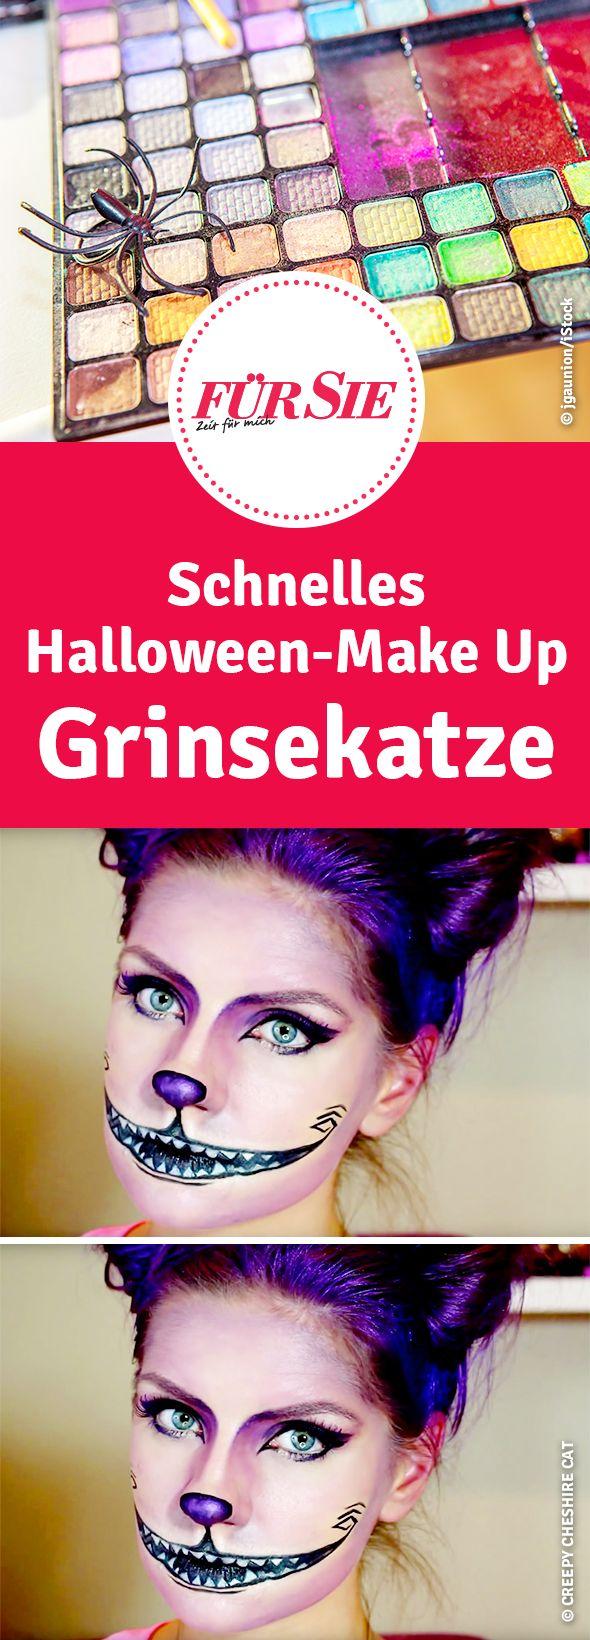 Top 5 Halloween Make-ups